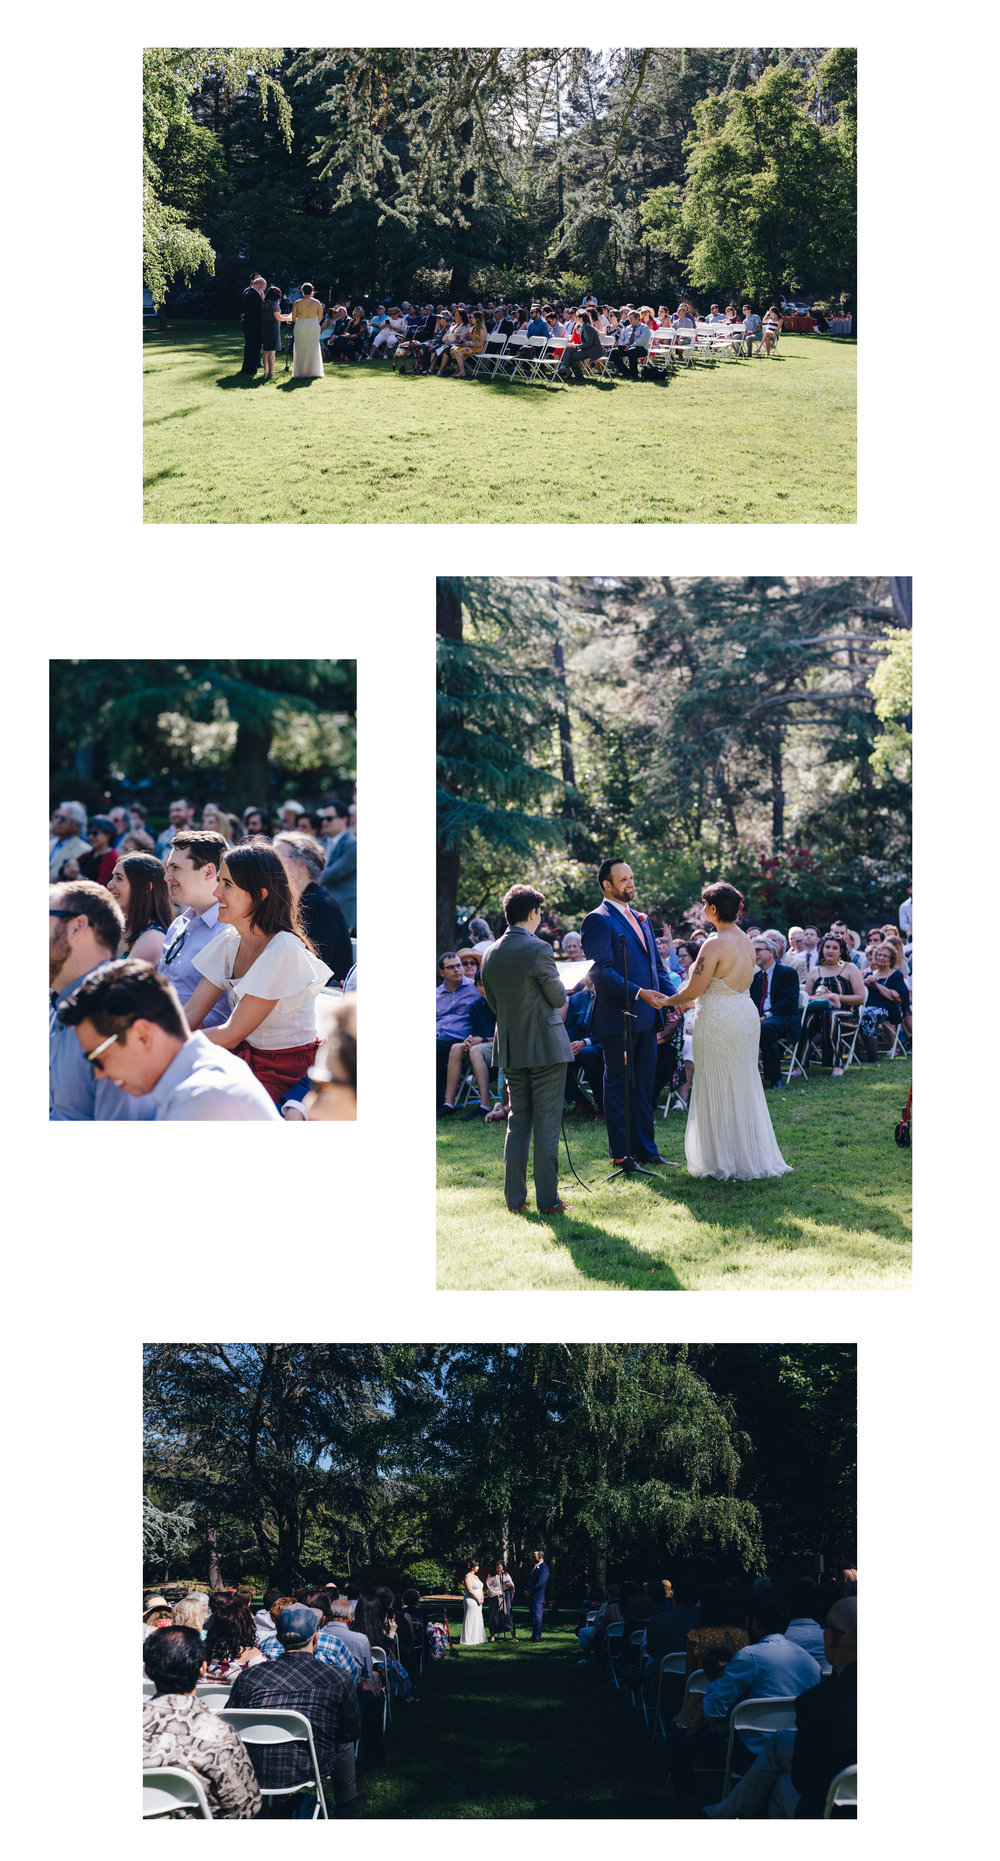 IG_wedding (30 of 110) copy.jpg